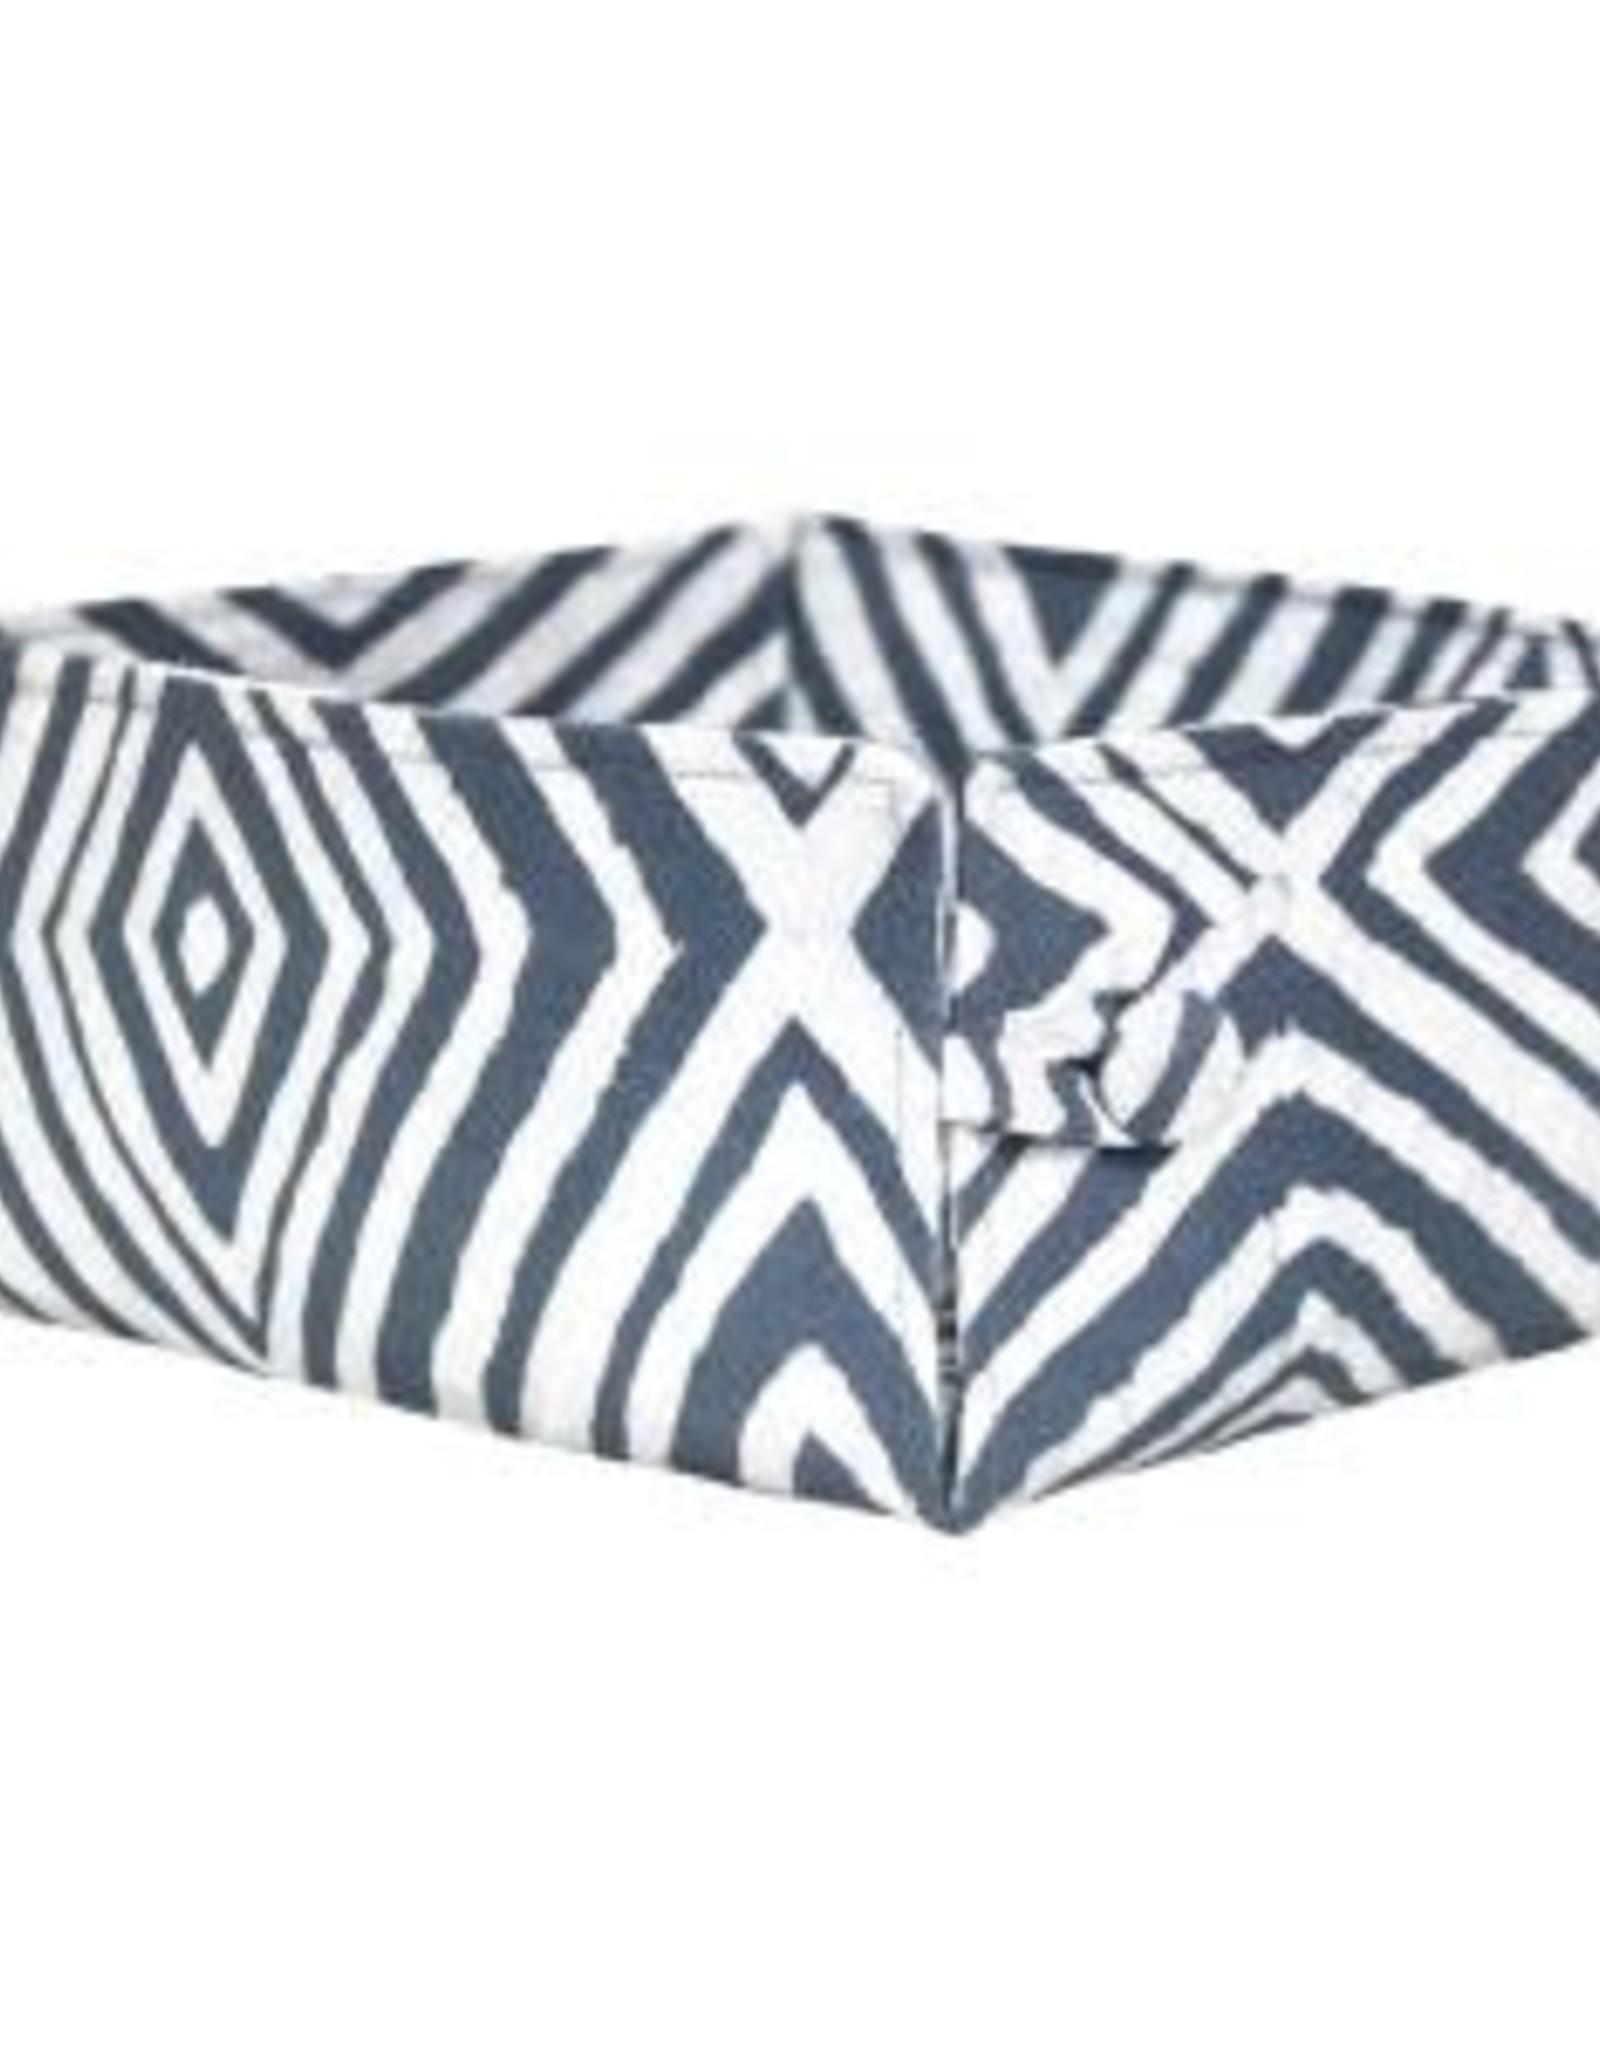 Ghana, Button Basket, Silver Diamonds